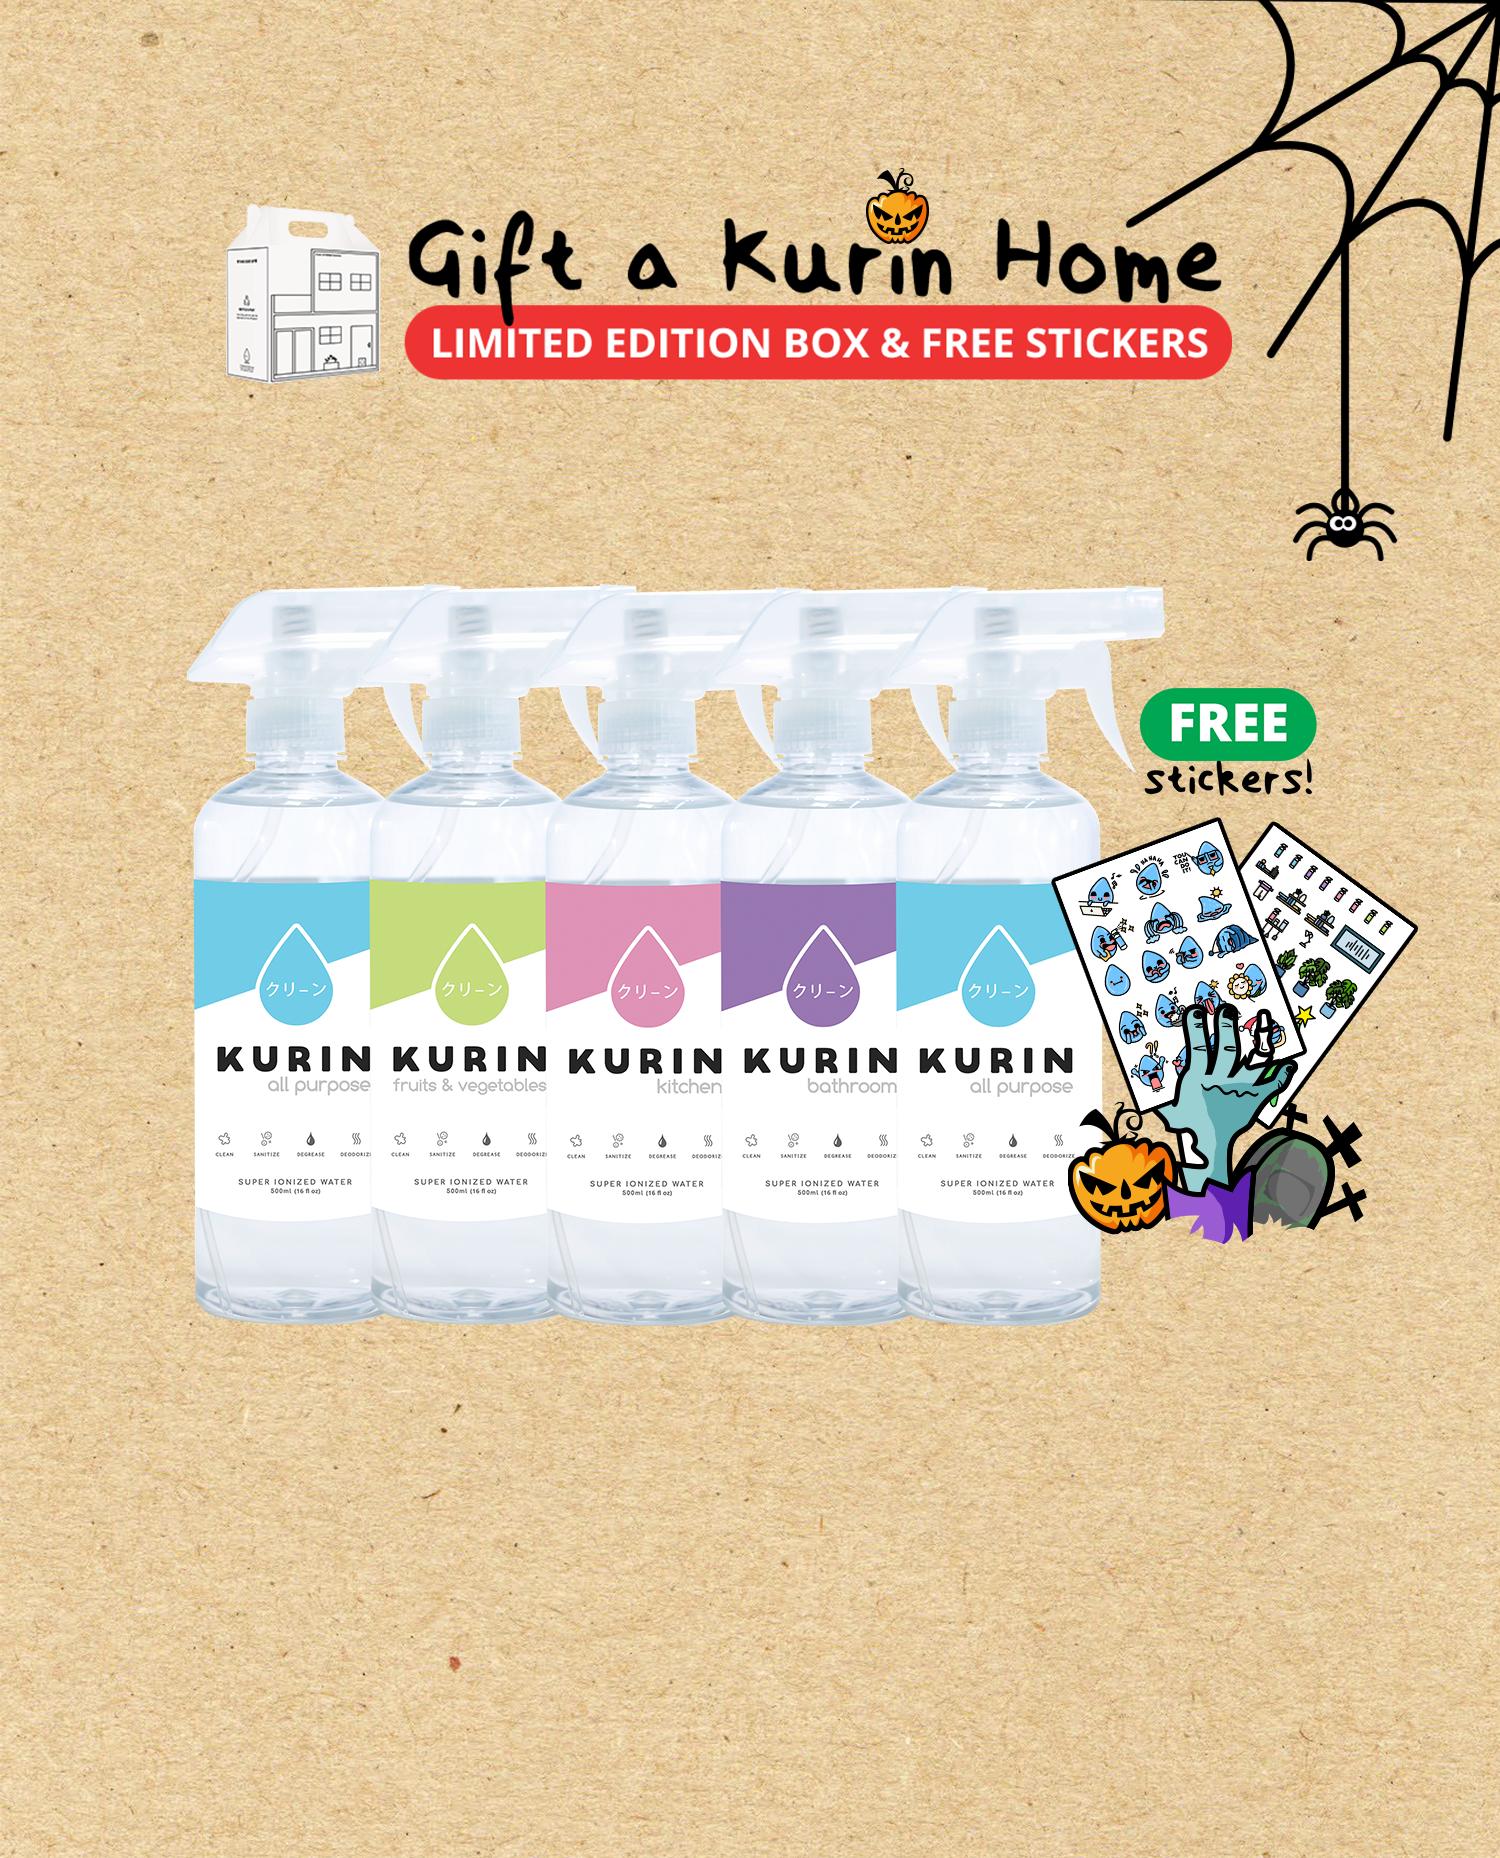 Gift a Kurin Pack